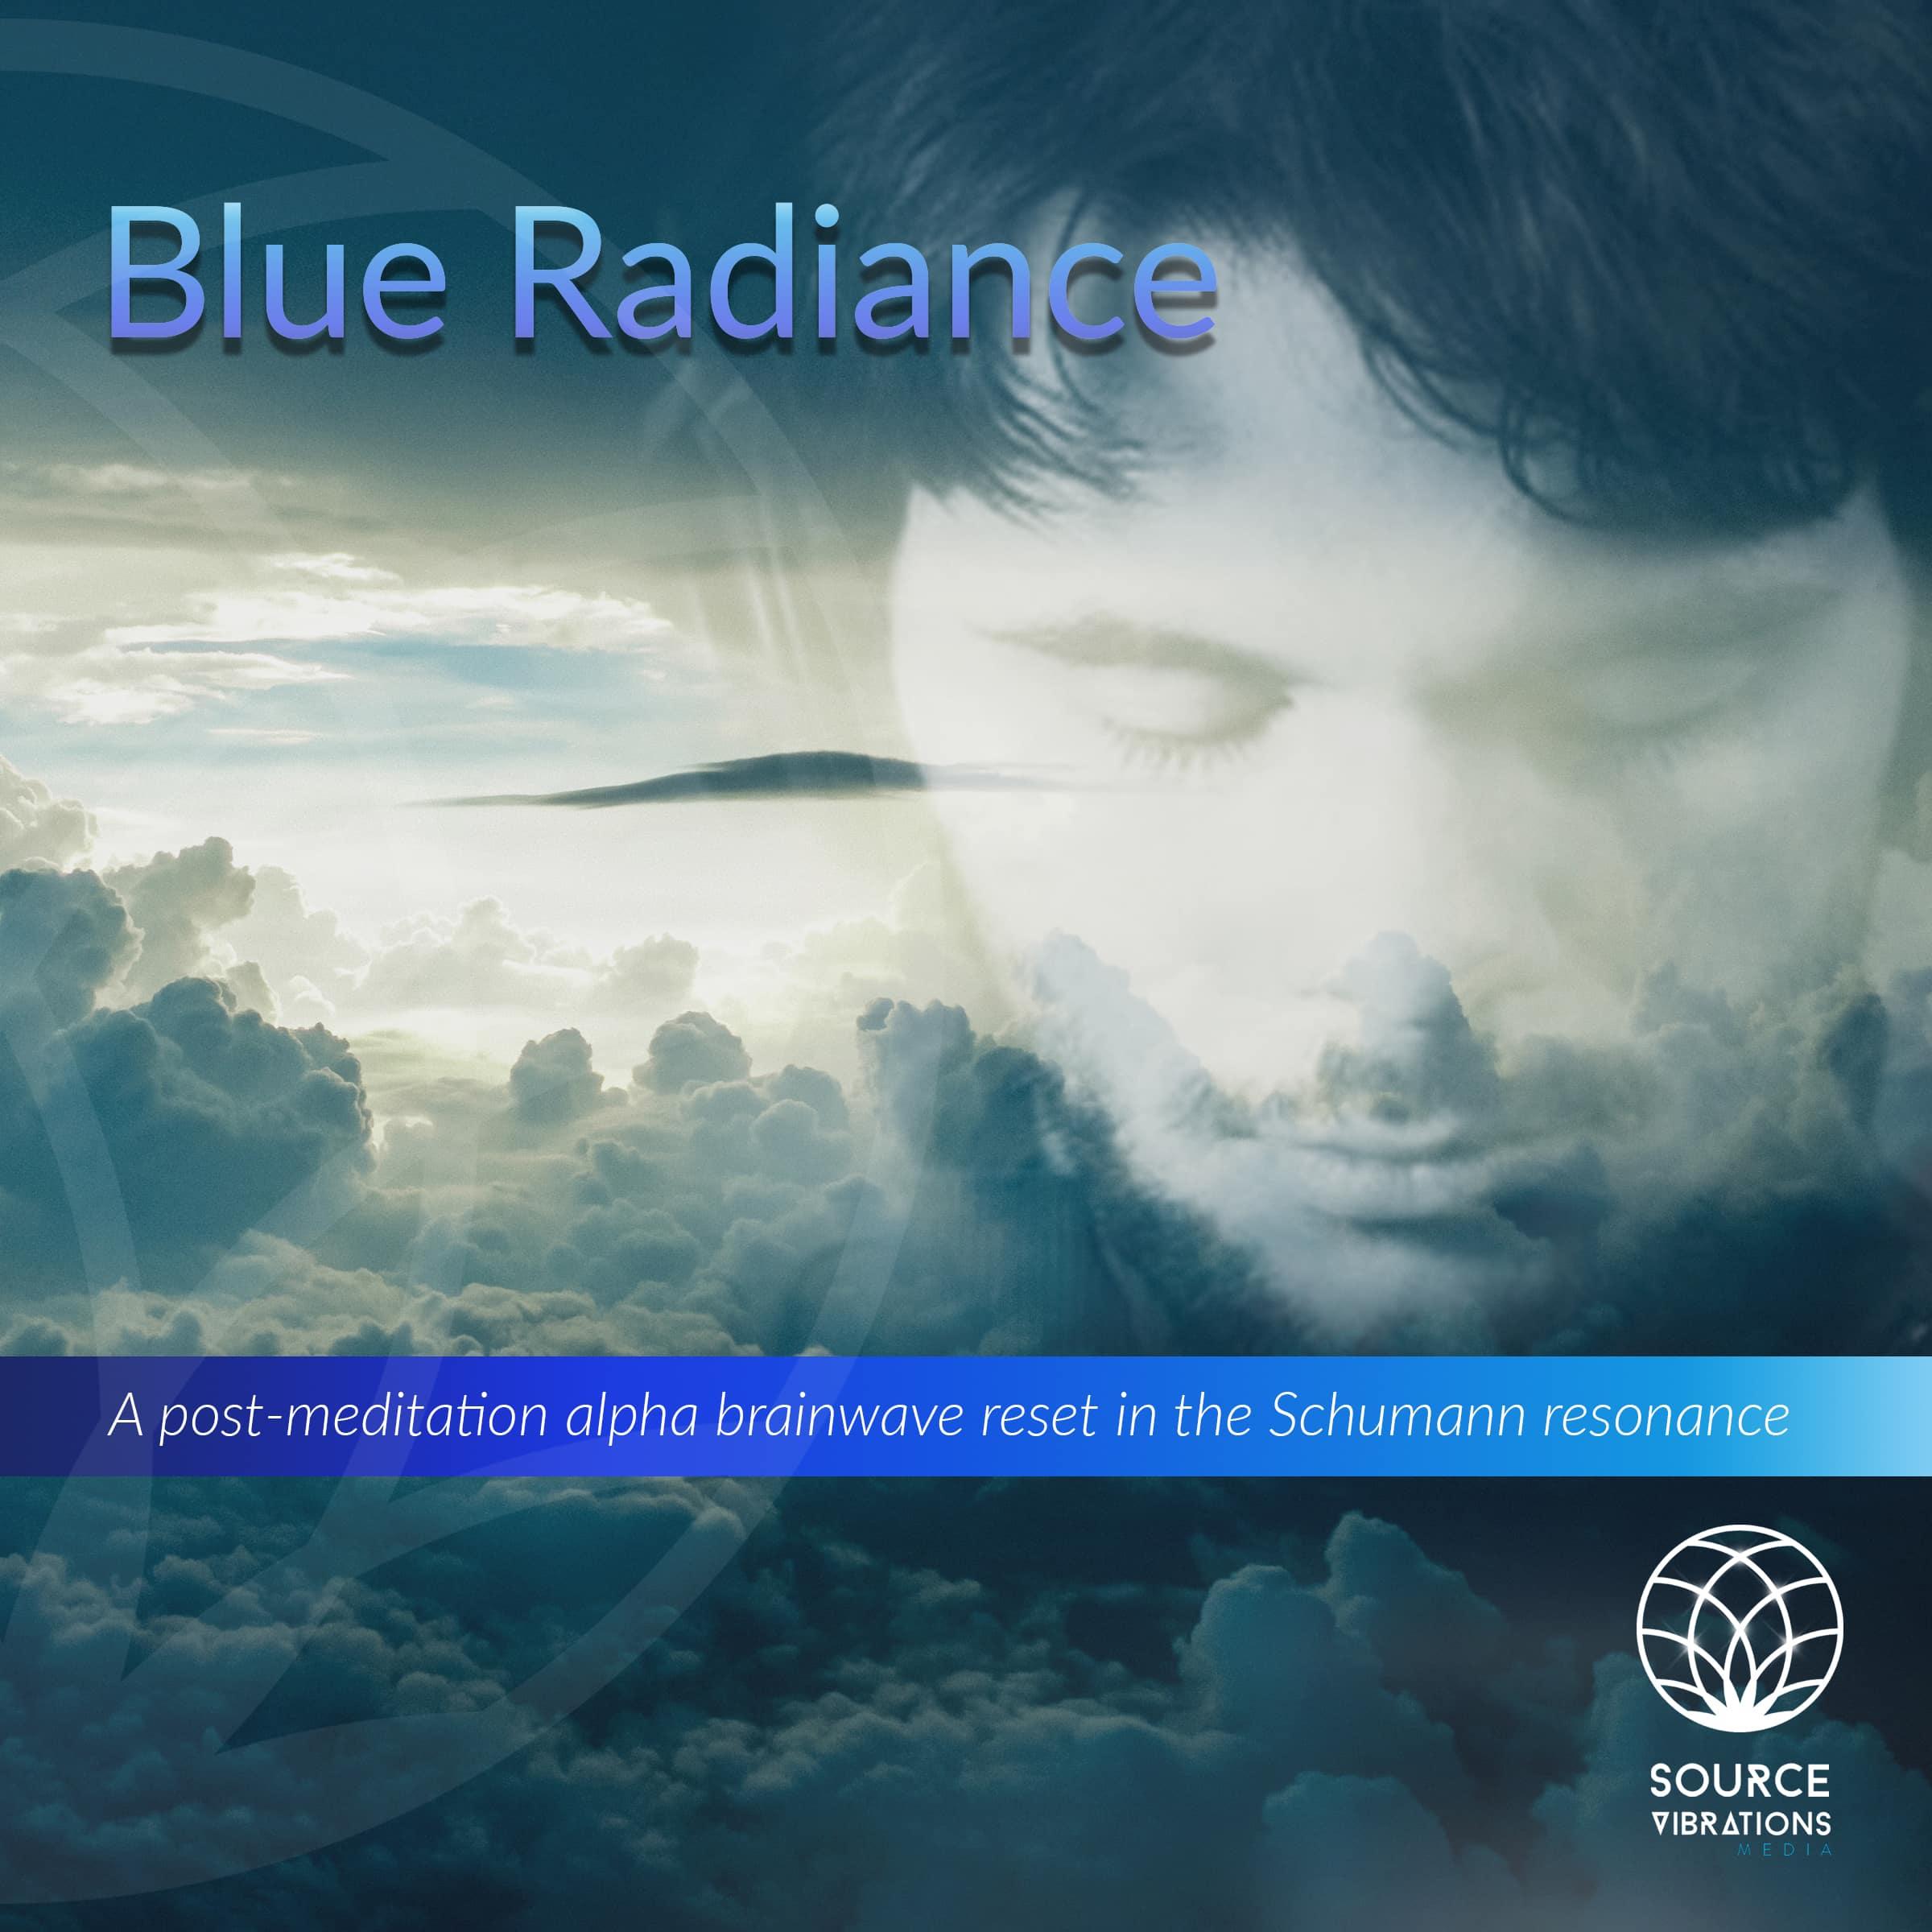 Blue Radiance ~ Free Alpha Brainwave Entrainment Reset for Post